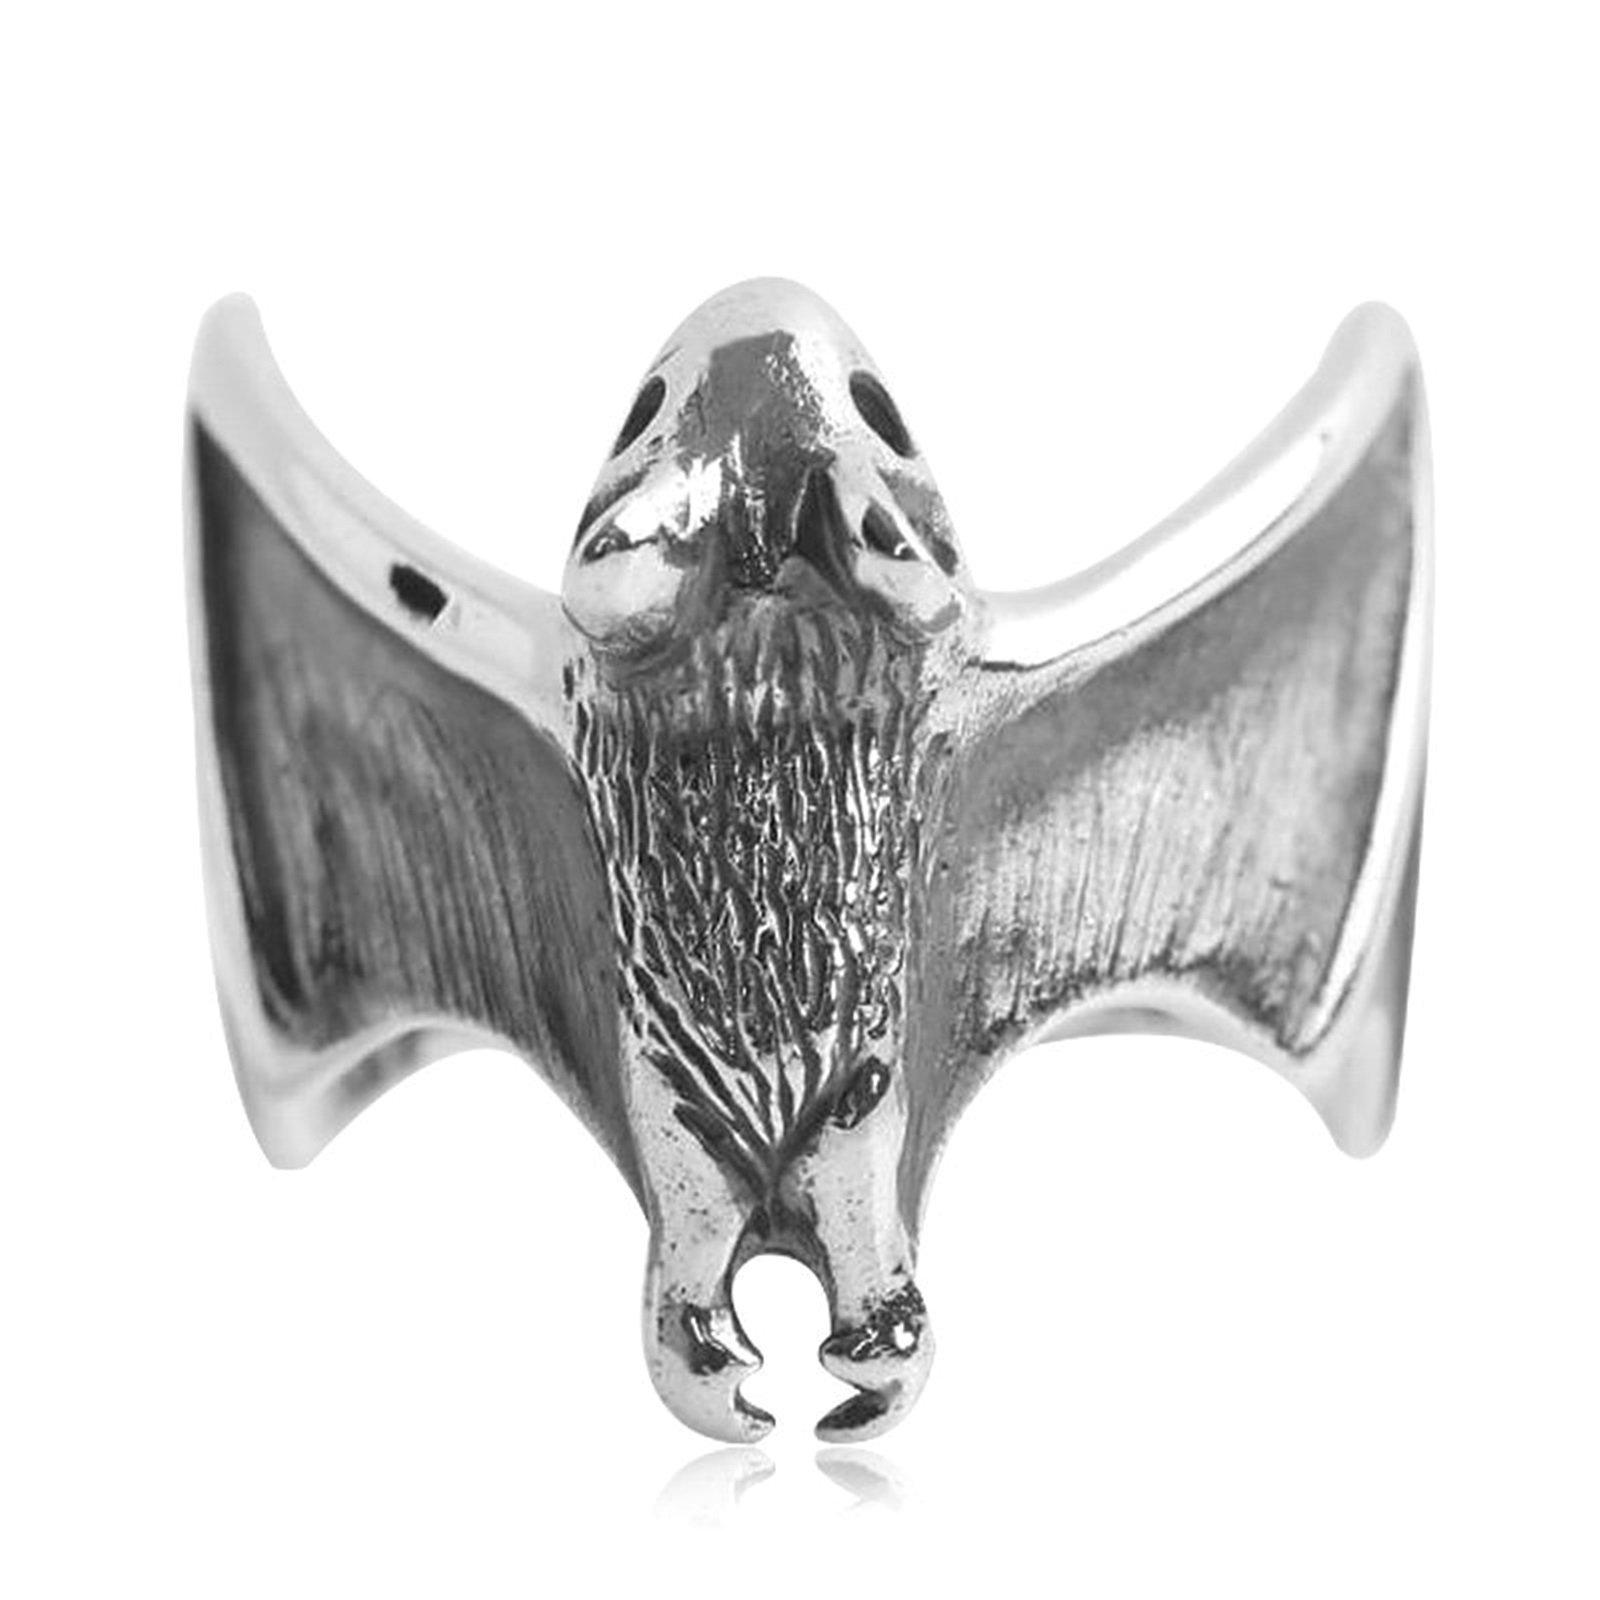 Adisaer Biker Rings Silver Ring for Men Adjustable Bat Ring Size 8 Vintage Punk Jewelry